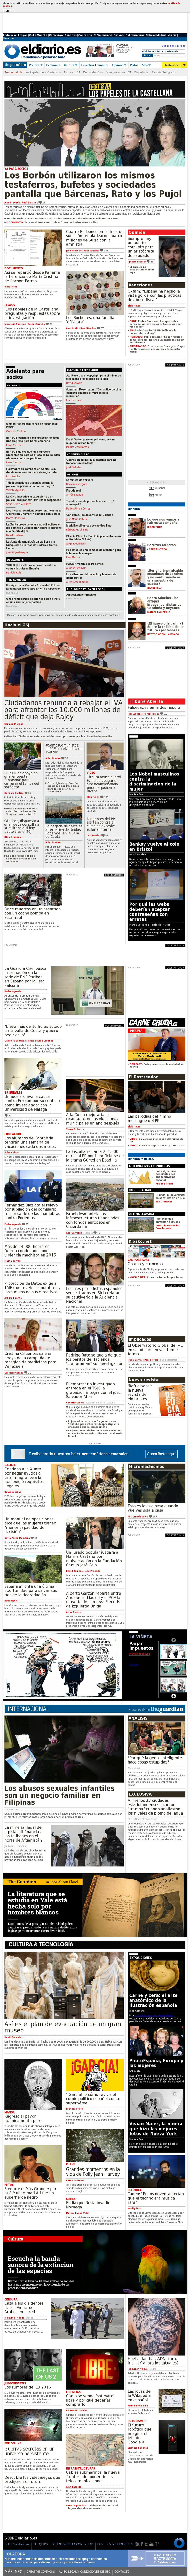 El Diario at Wednesday June 8, 2016, 2:05 a.m. UTC